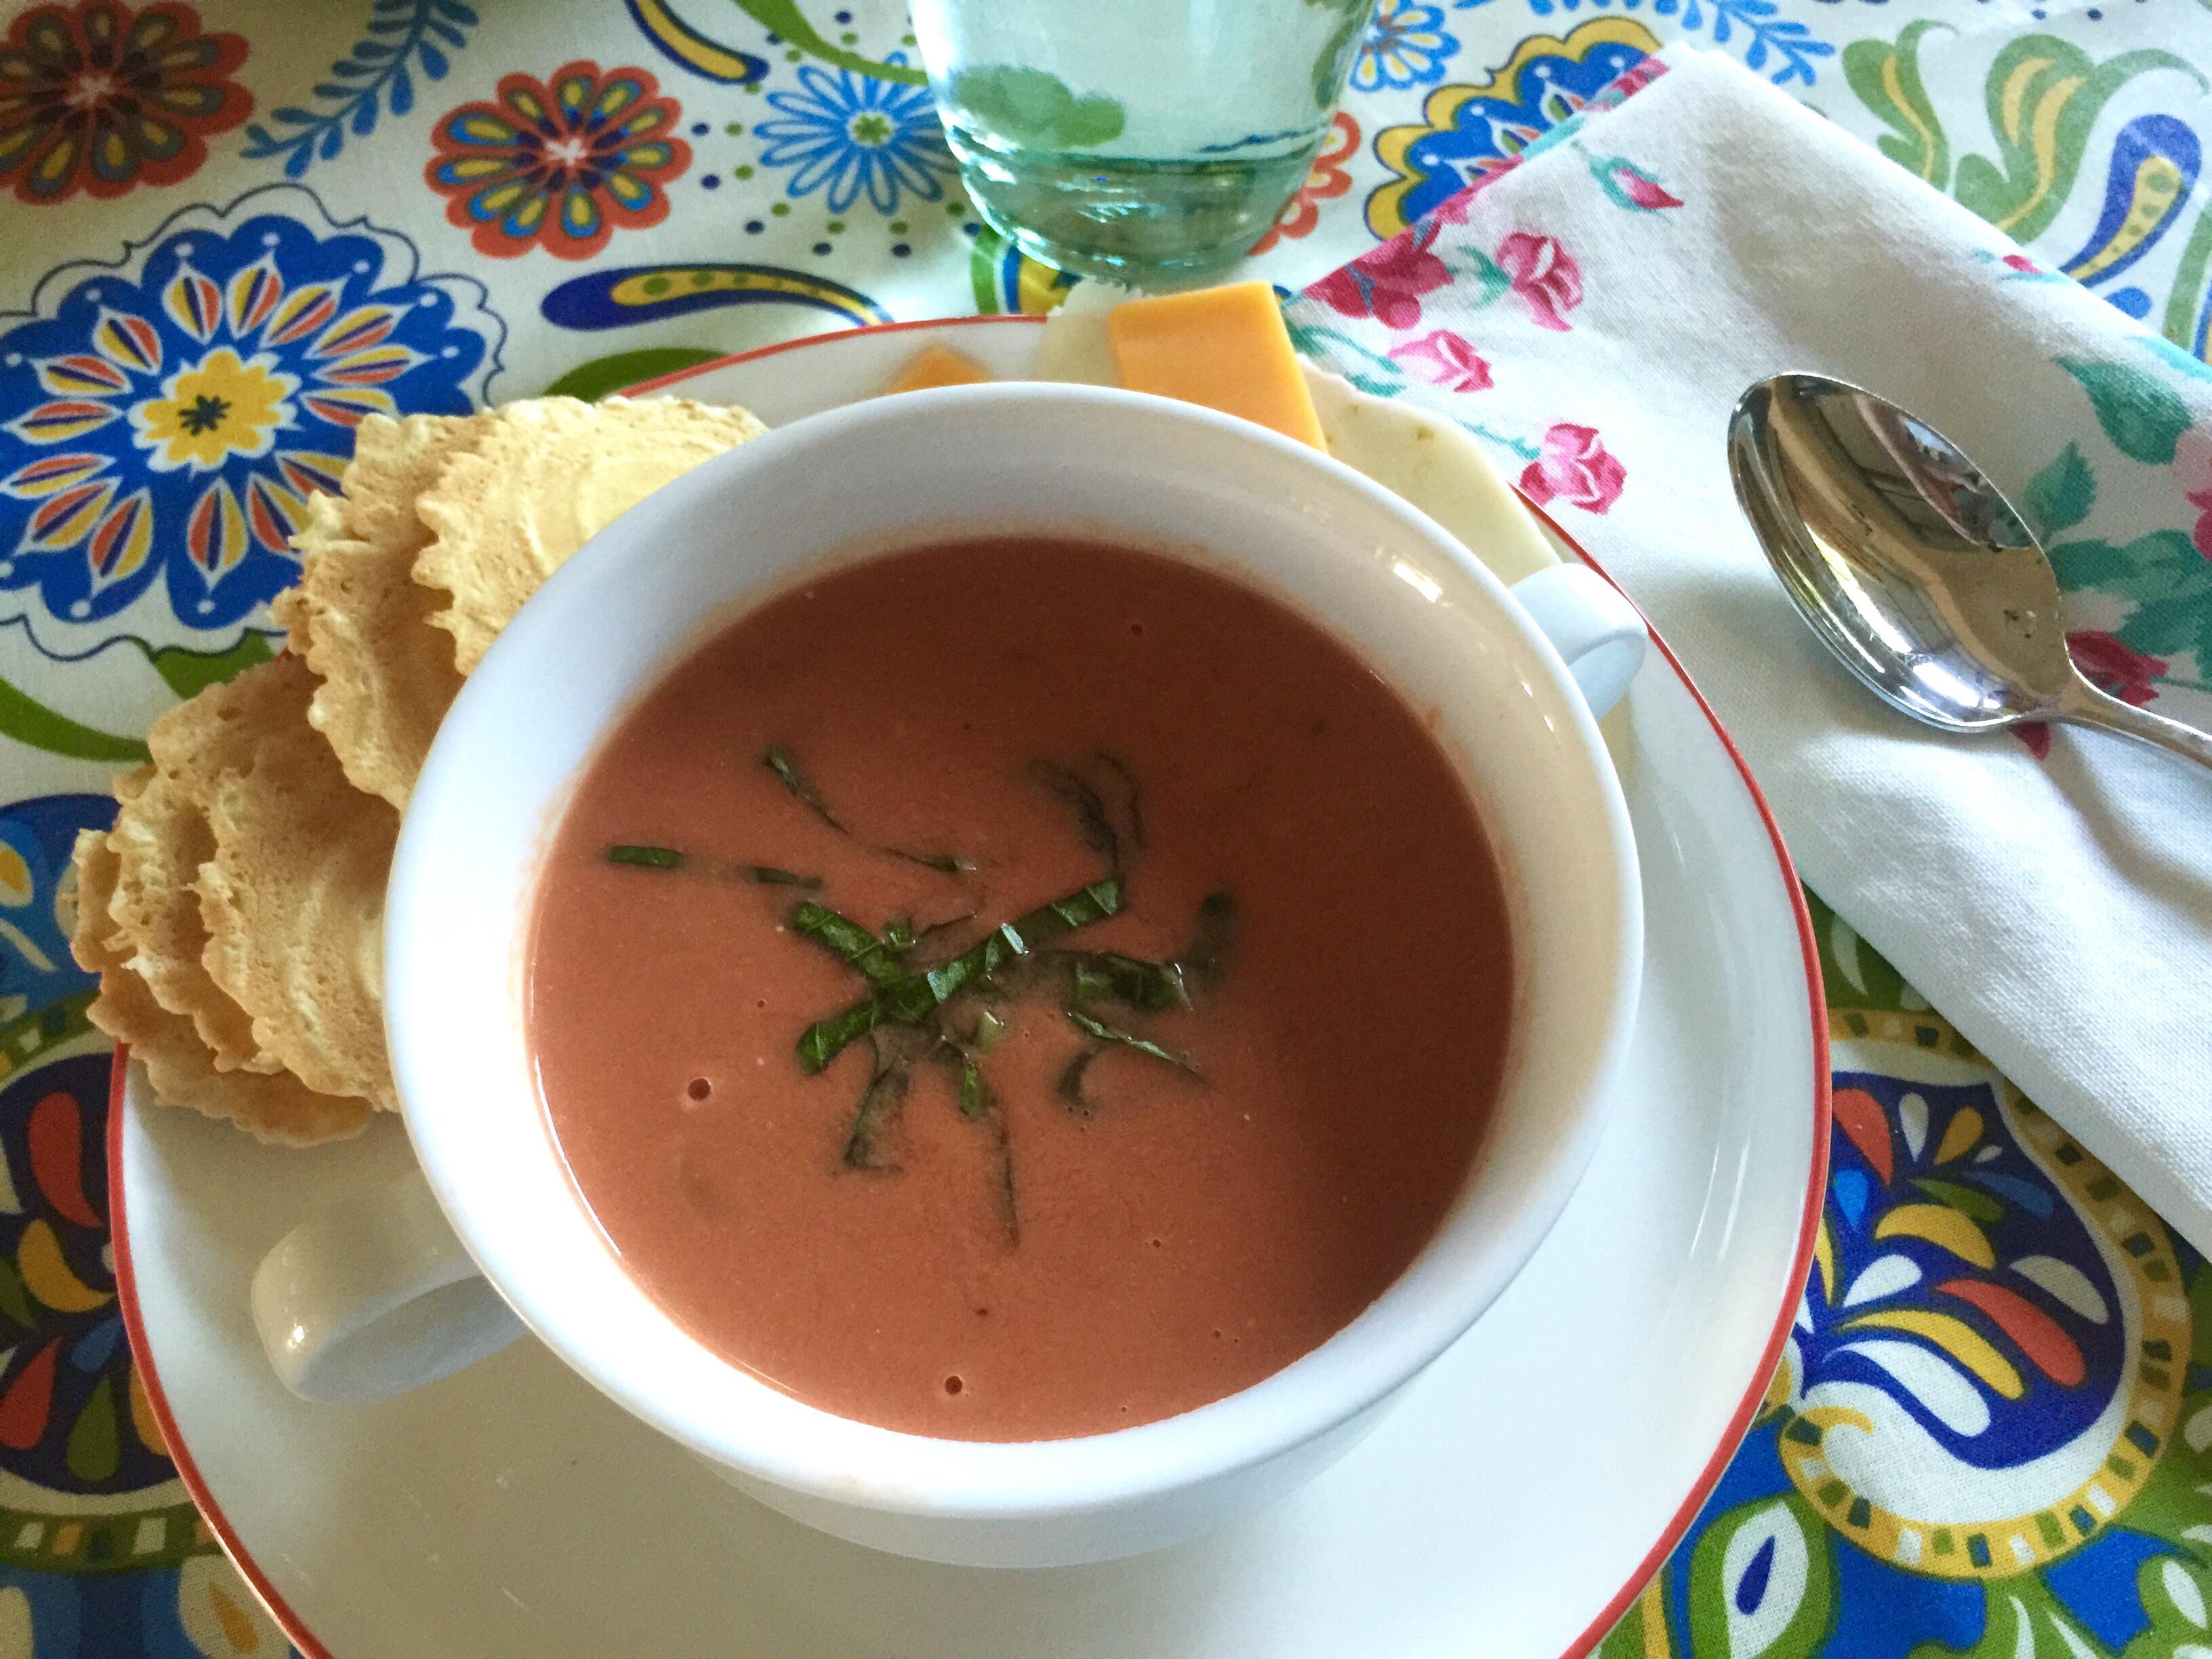 Homemade ((Quick)) Creamy Tomato Basil Soup